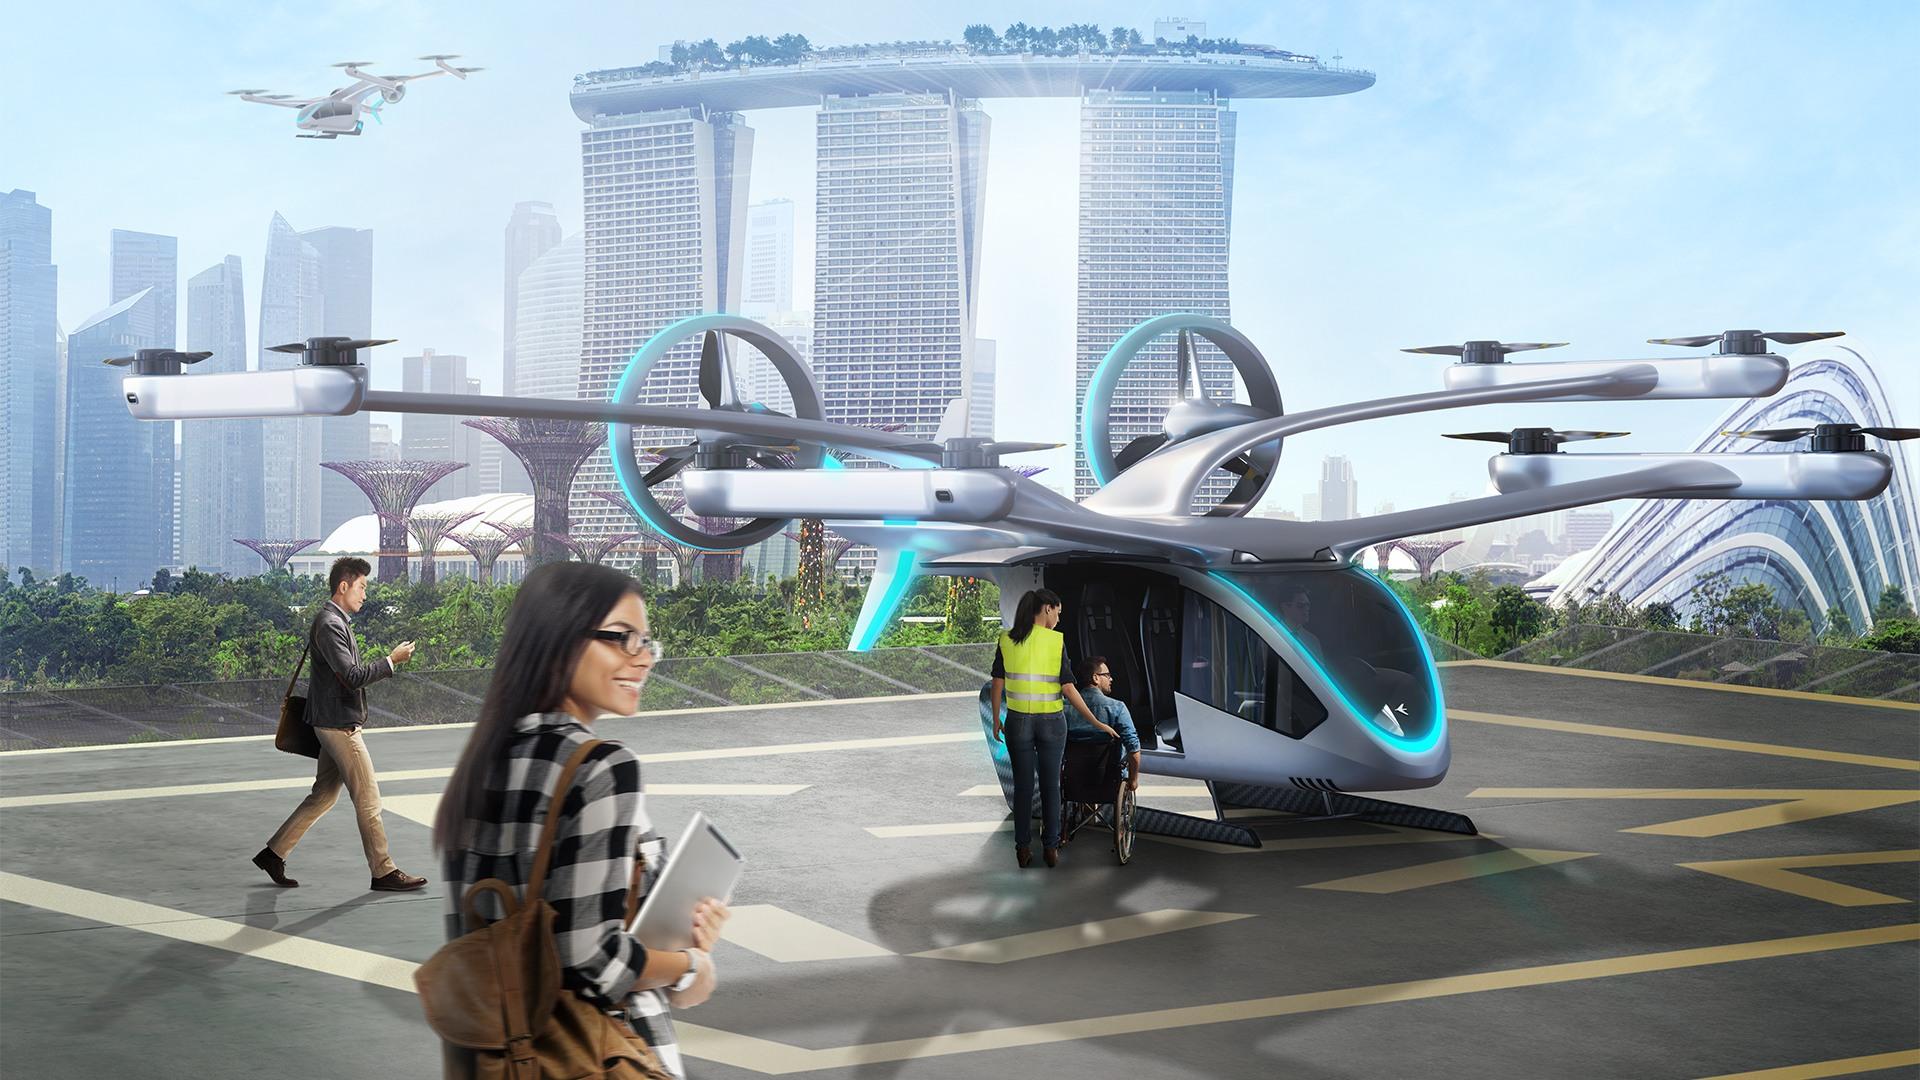 MaaS air taxi concept image